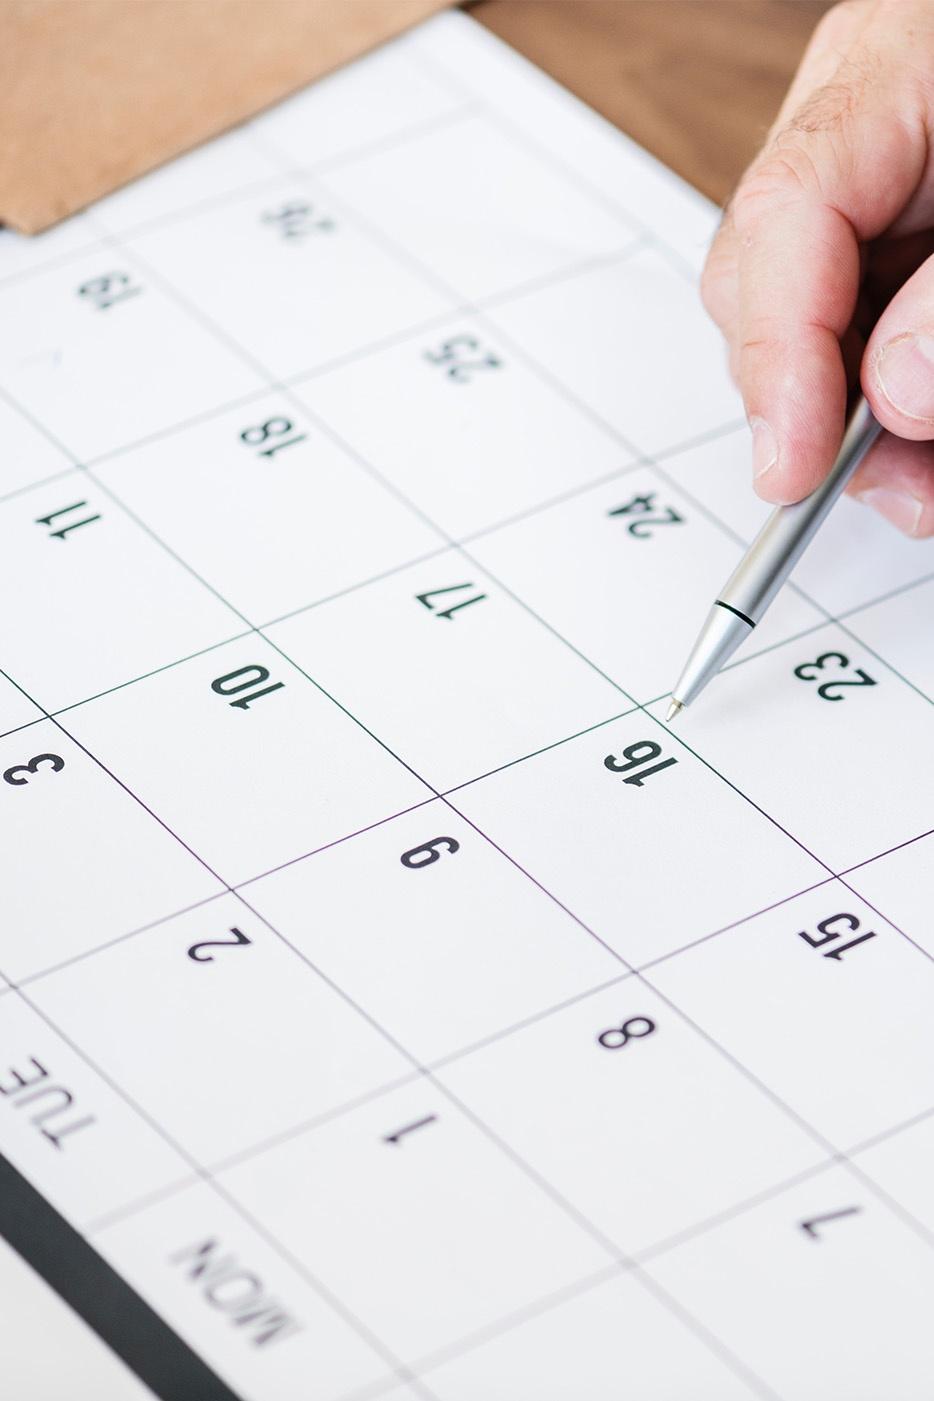 MBD_image_calendar-1